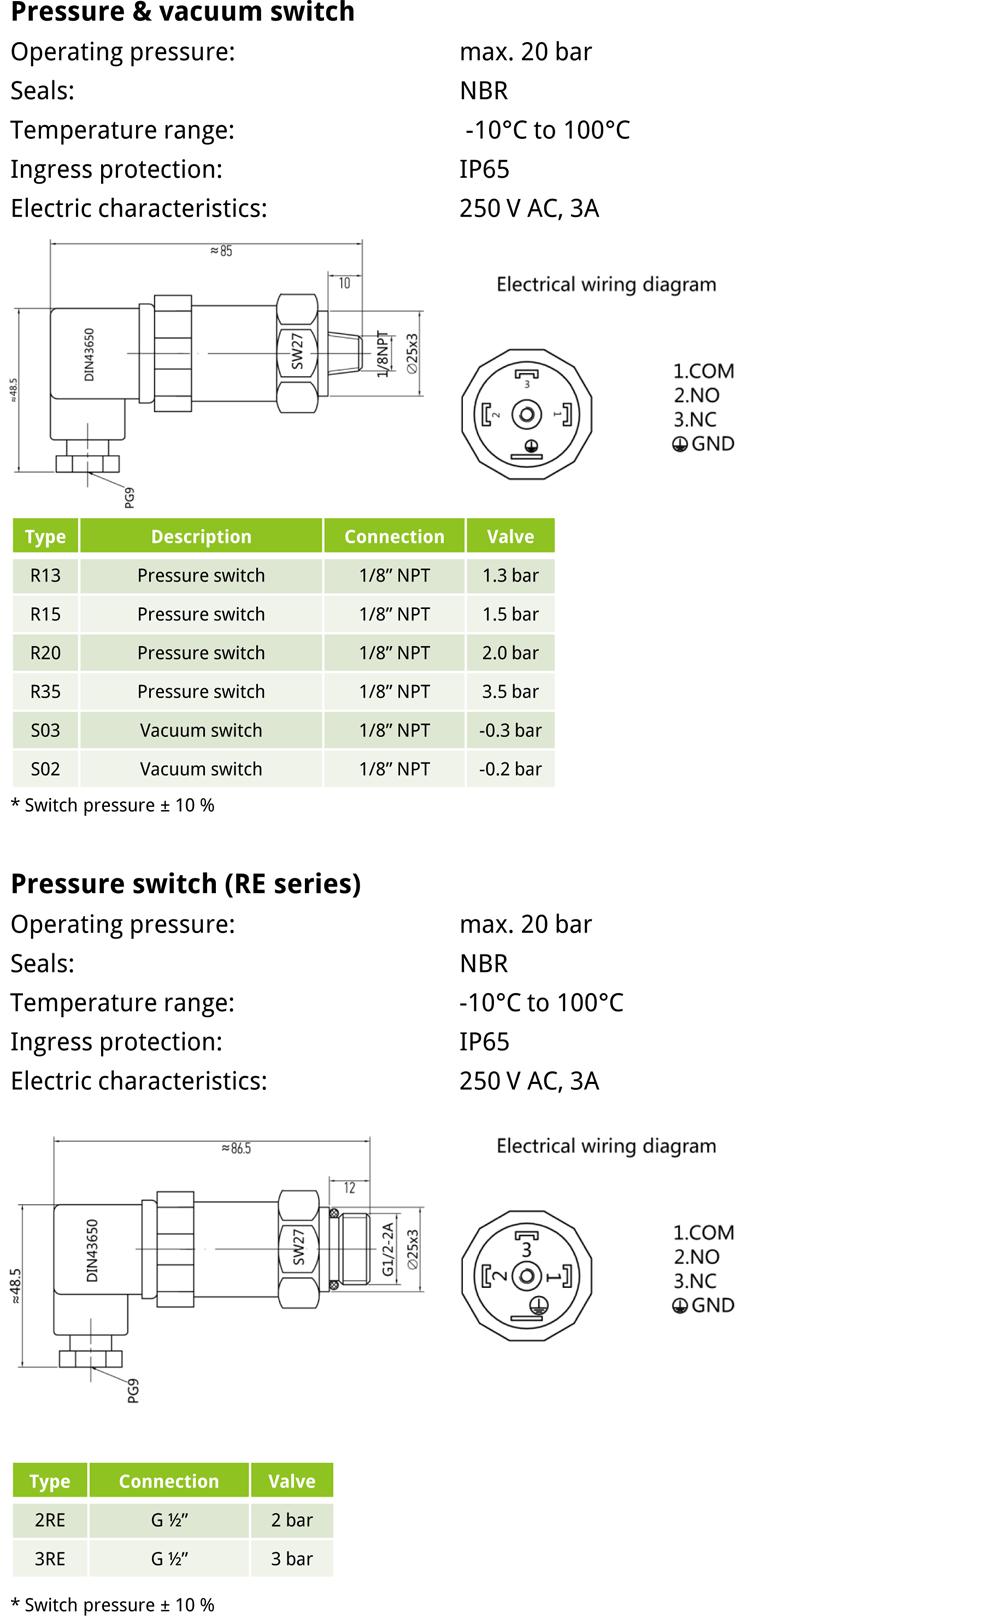 EVOTEK pressure and vacuum switch